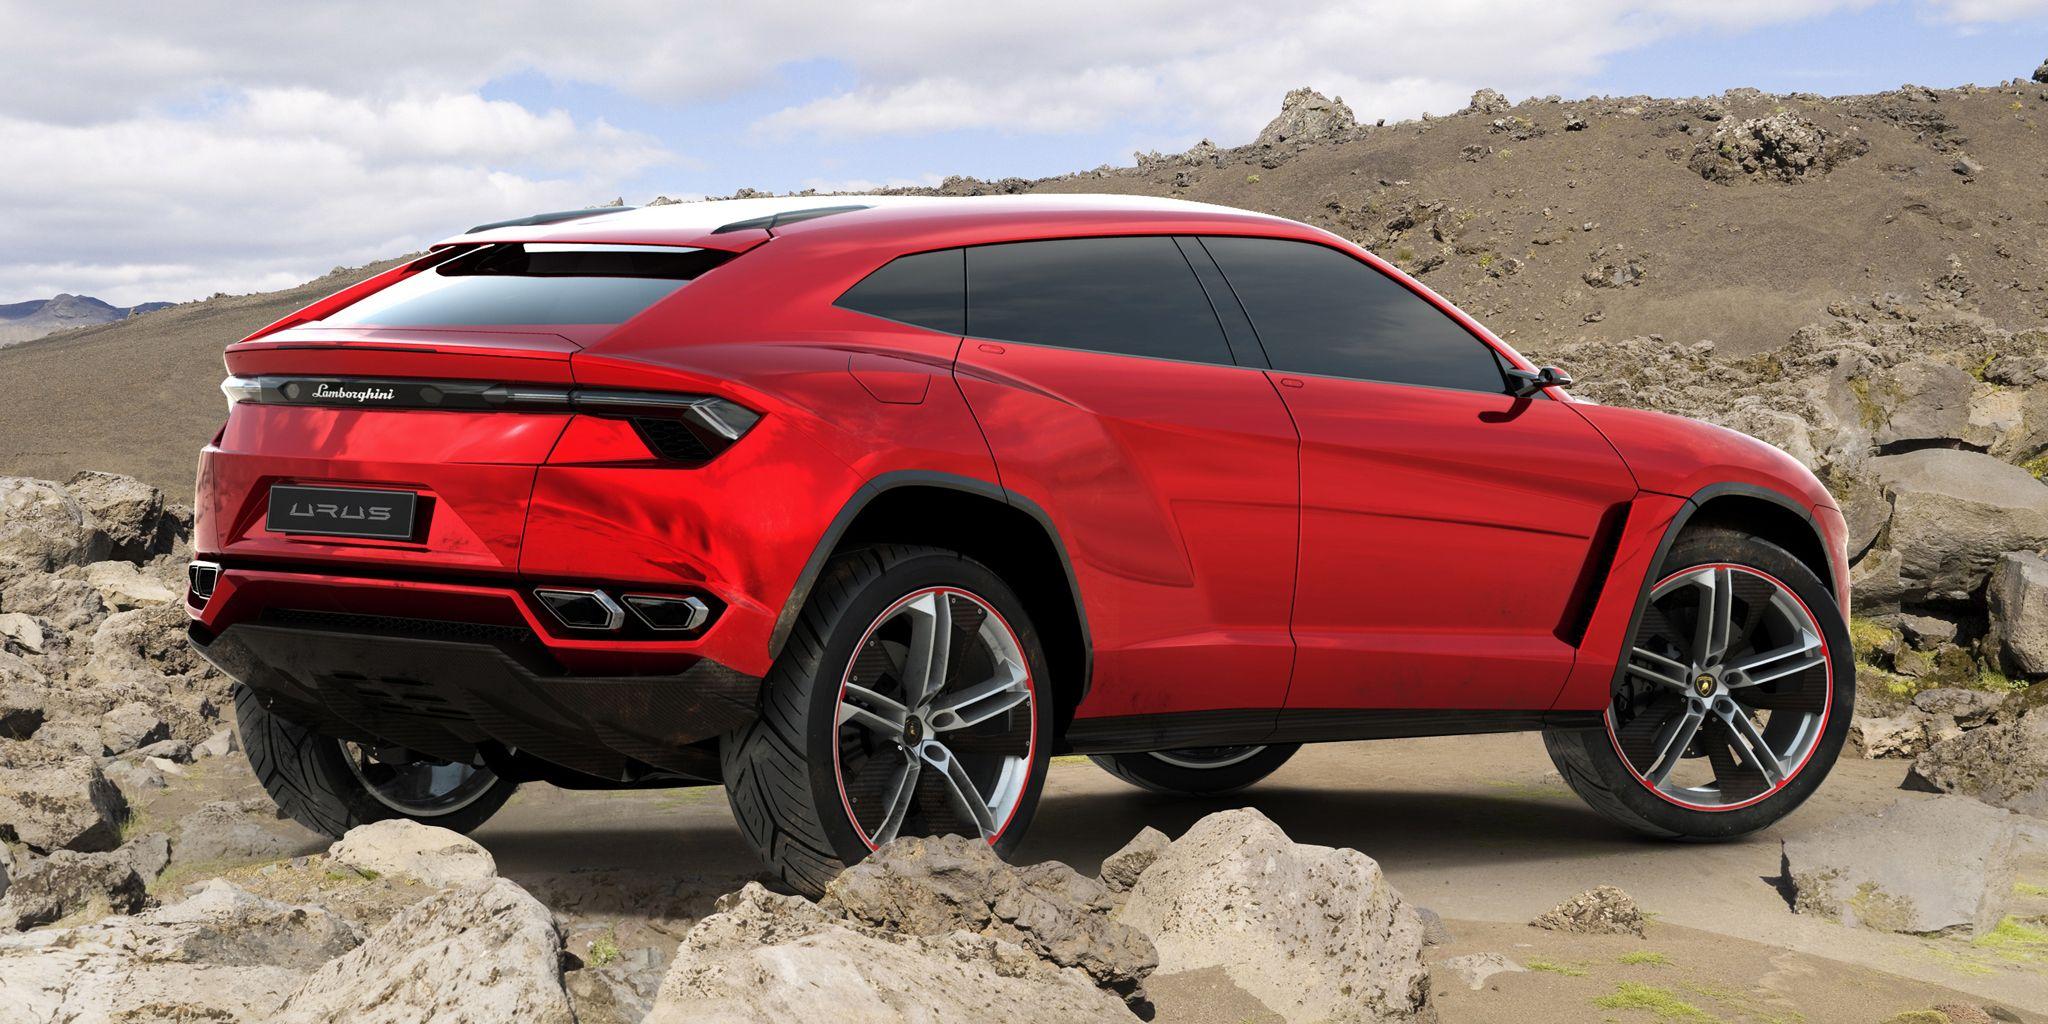 2019 Lamborghini Urus News, Price, Release Date , Everything